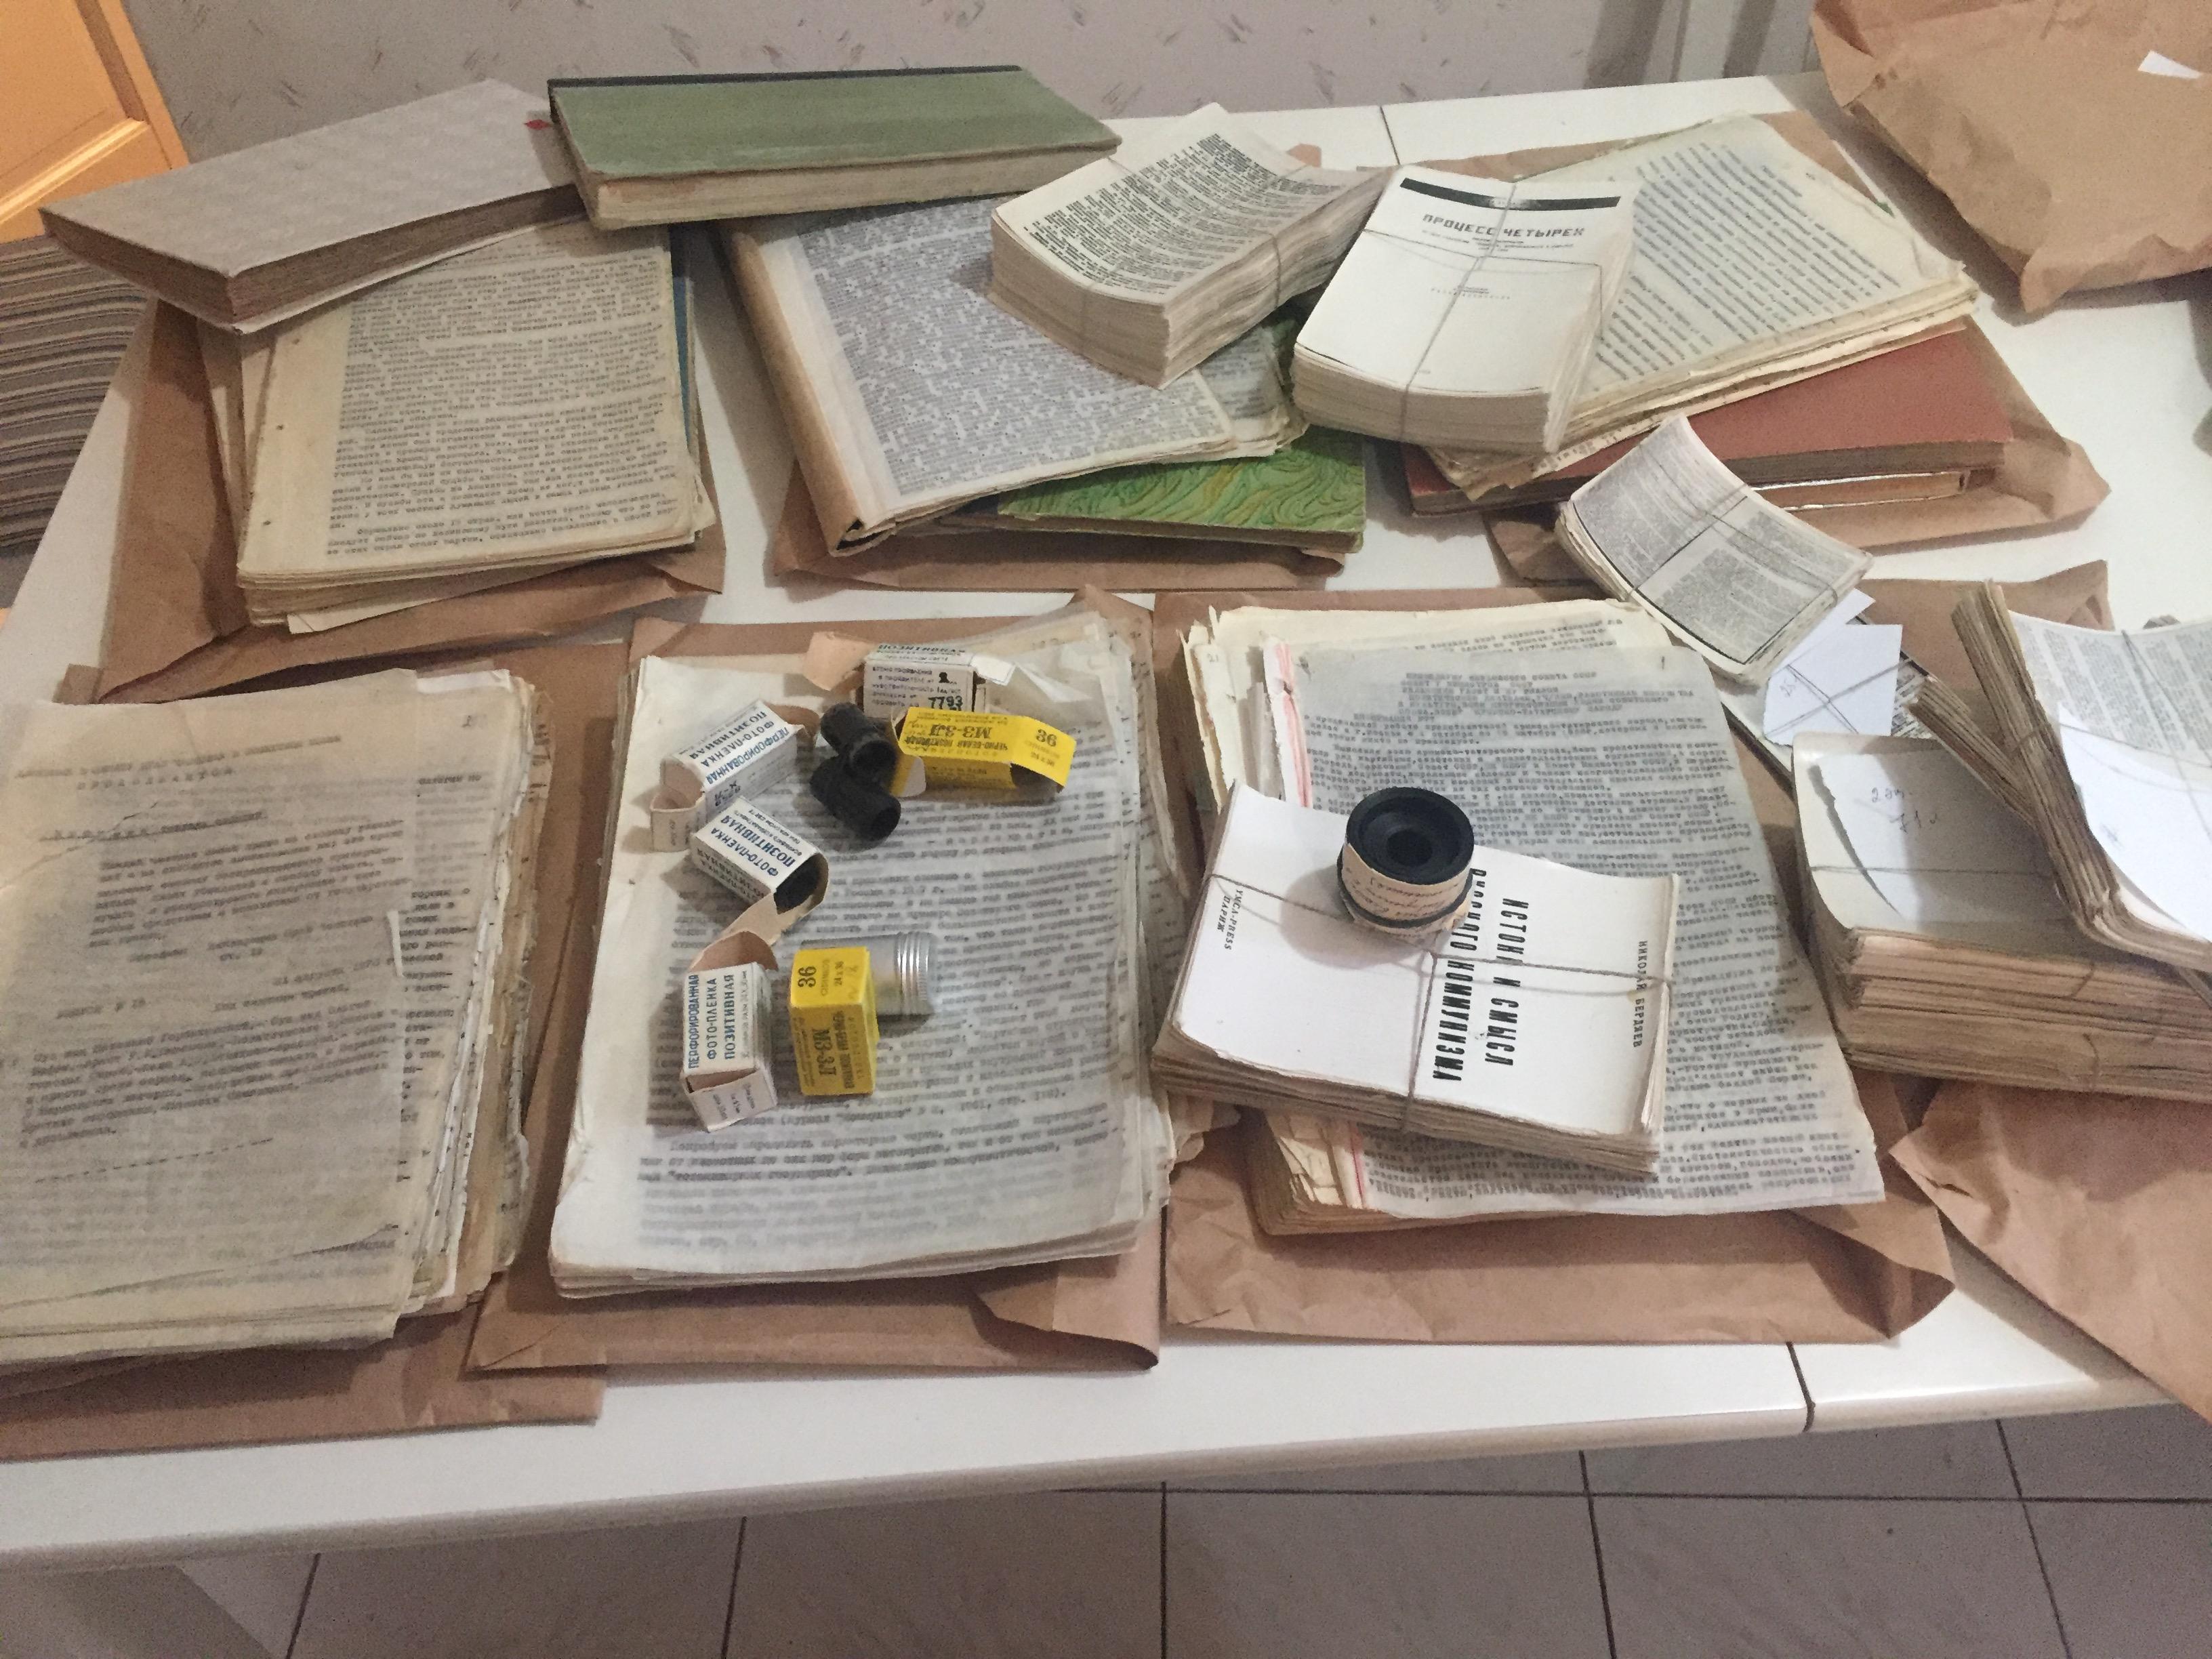 Ruský samzidat a negativy s neoficiální literaturou v SSSR. By Nkrita - Own work, CC BY-SA 4.0, Link